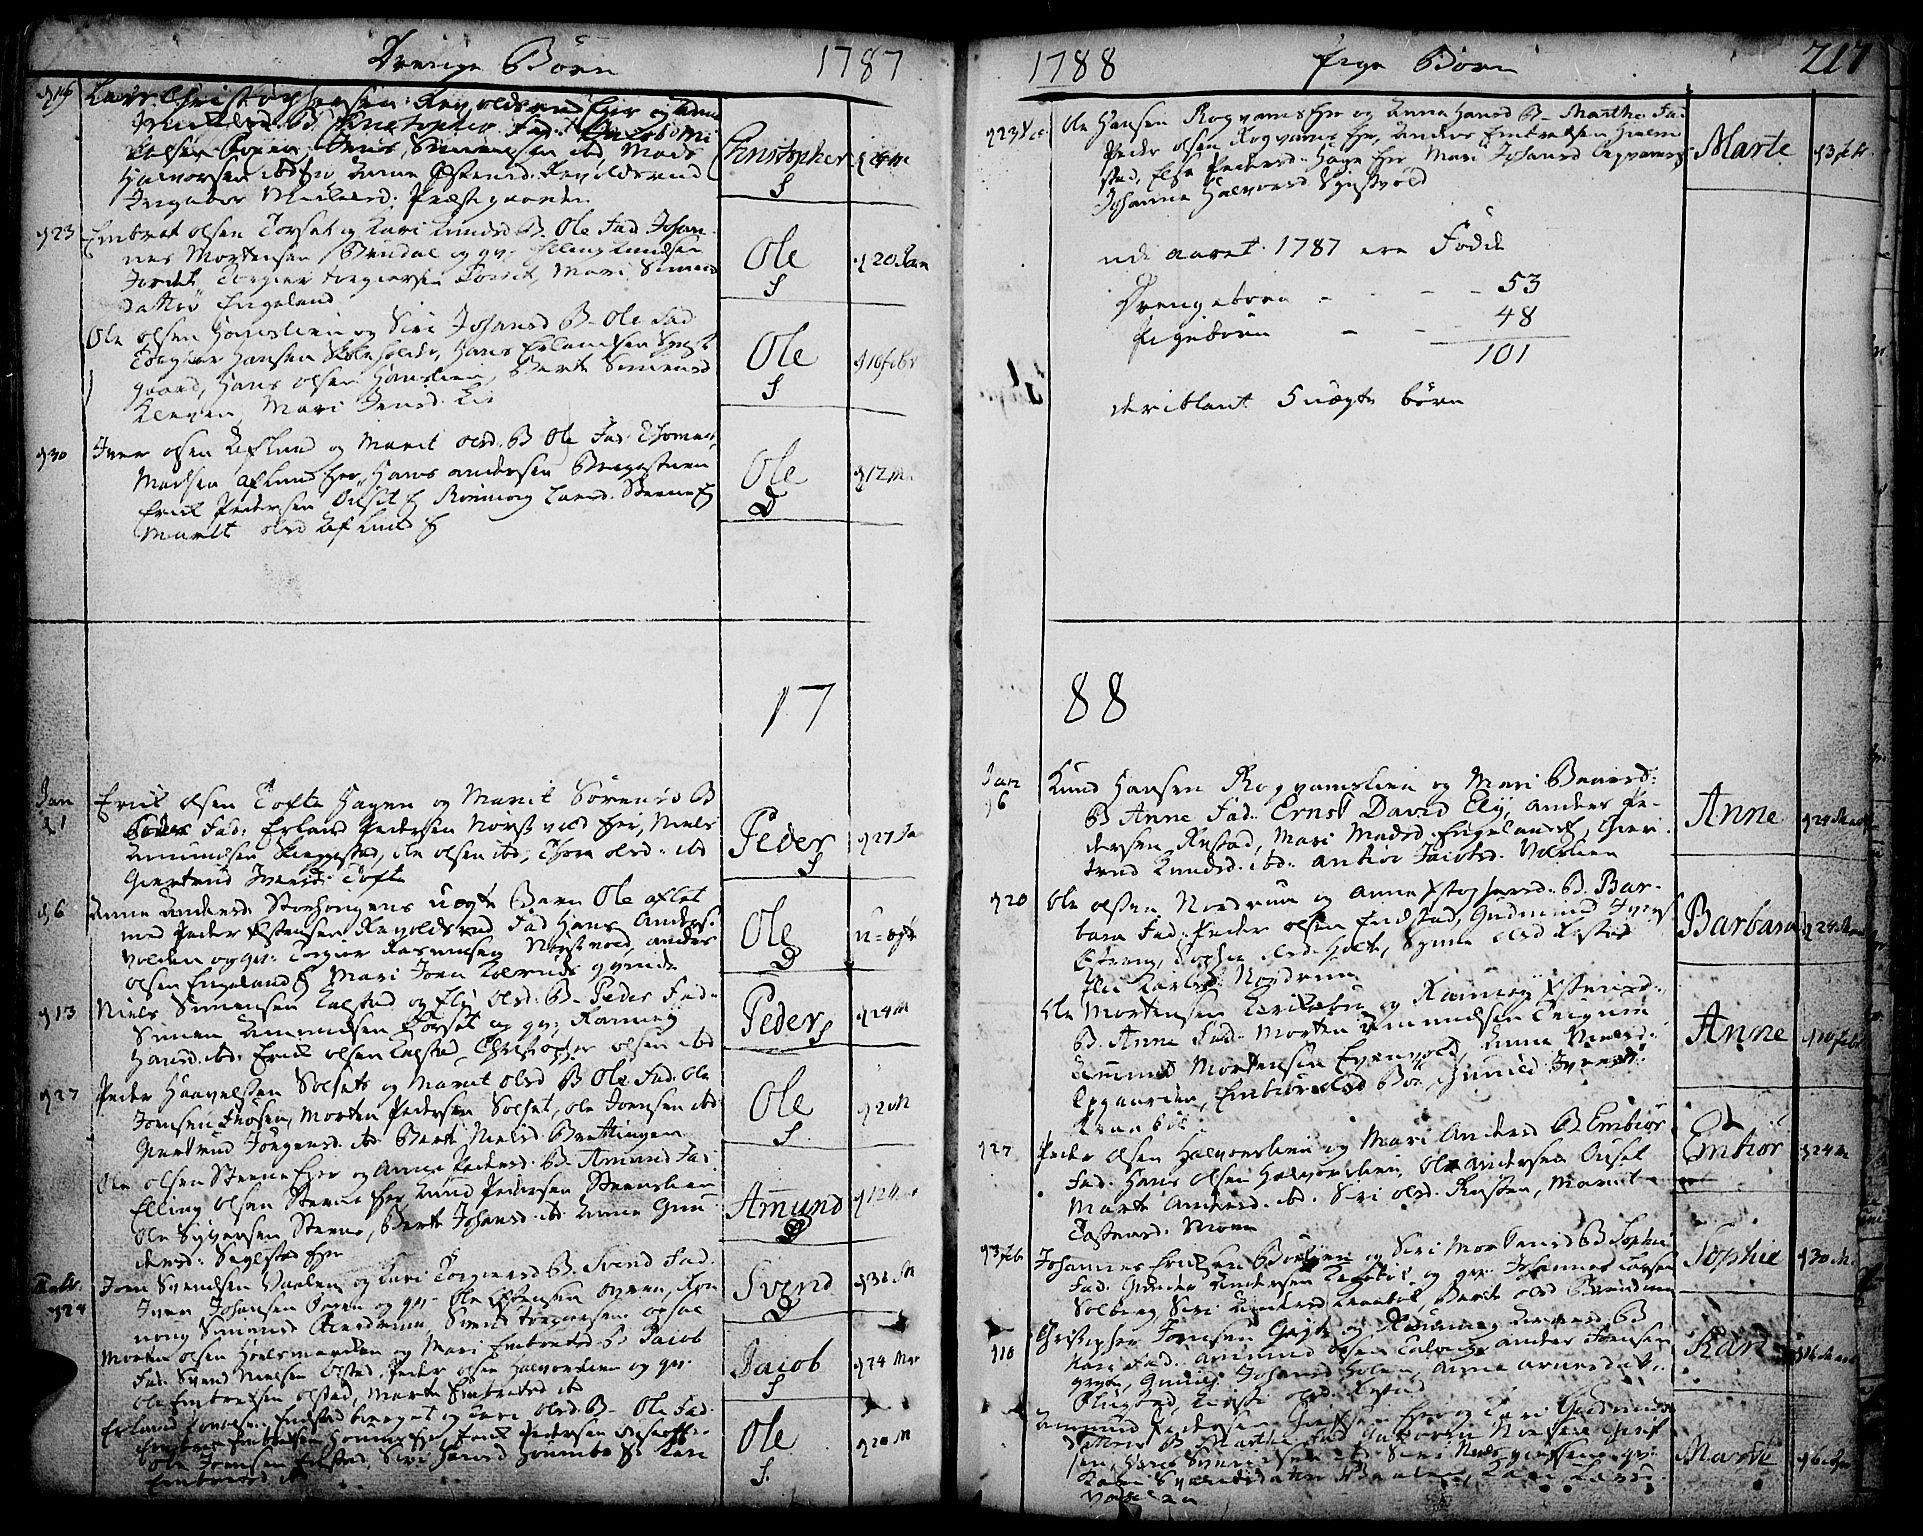 SAH, Gausdal prestekontor, Ministerialbok nr. 3, 1758-1809, s. 217